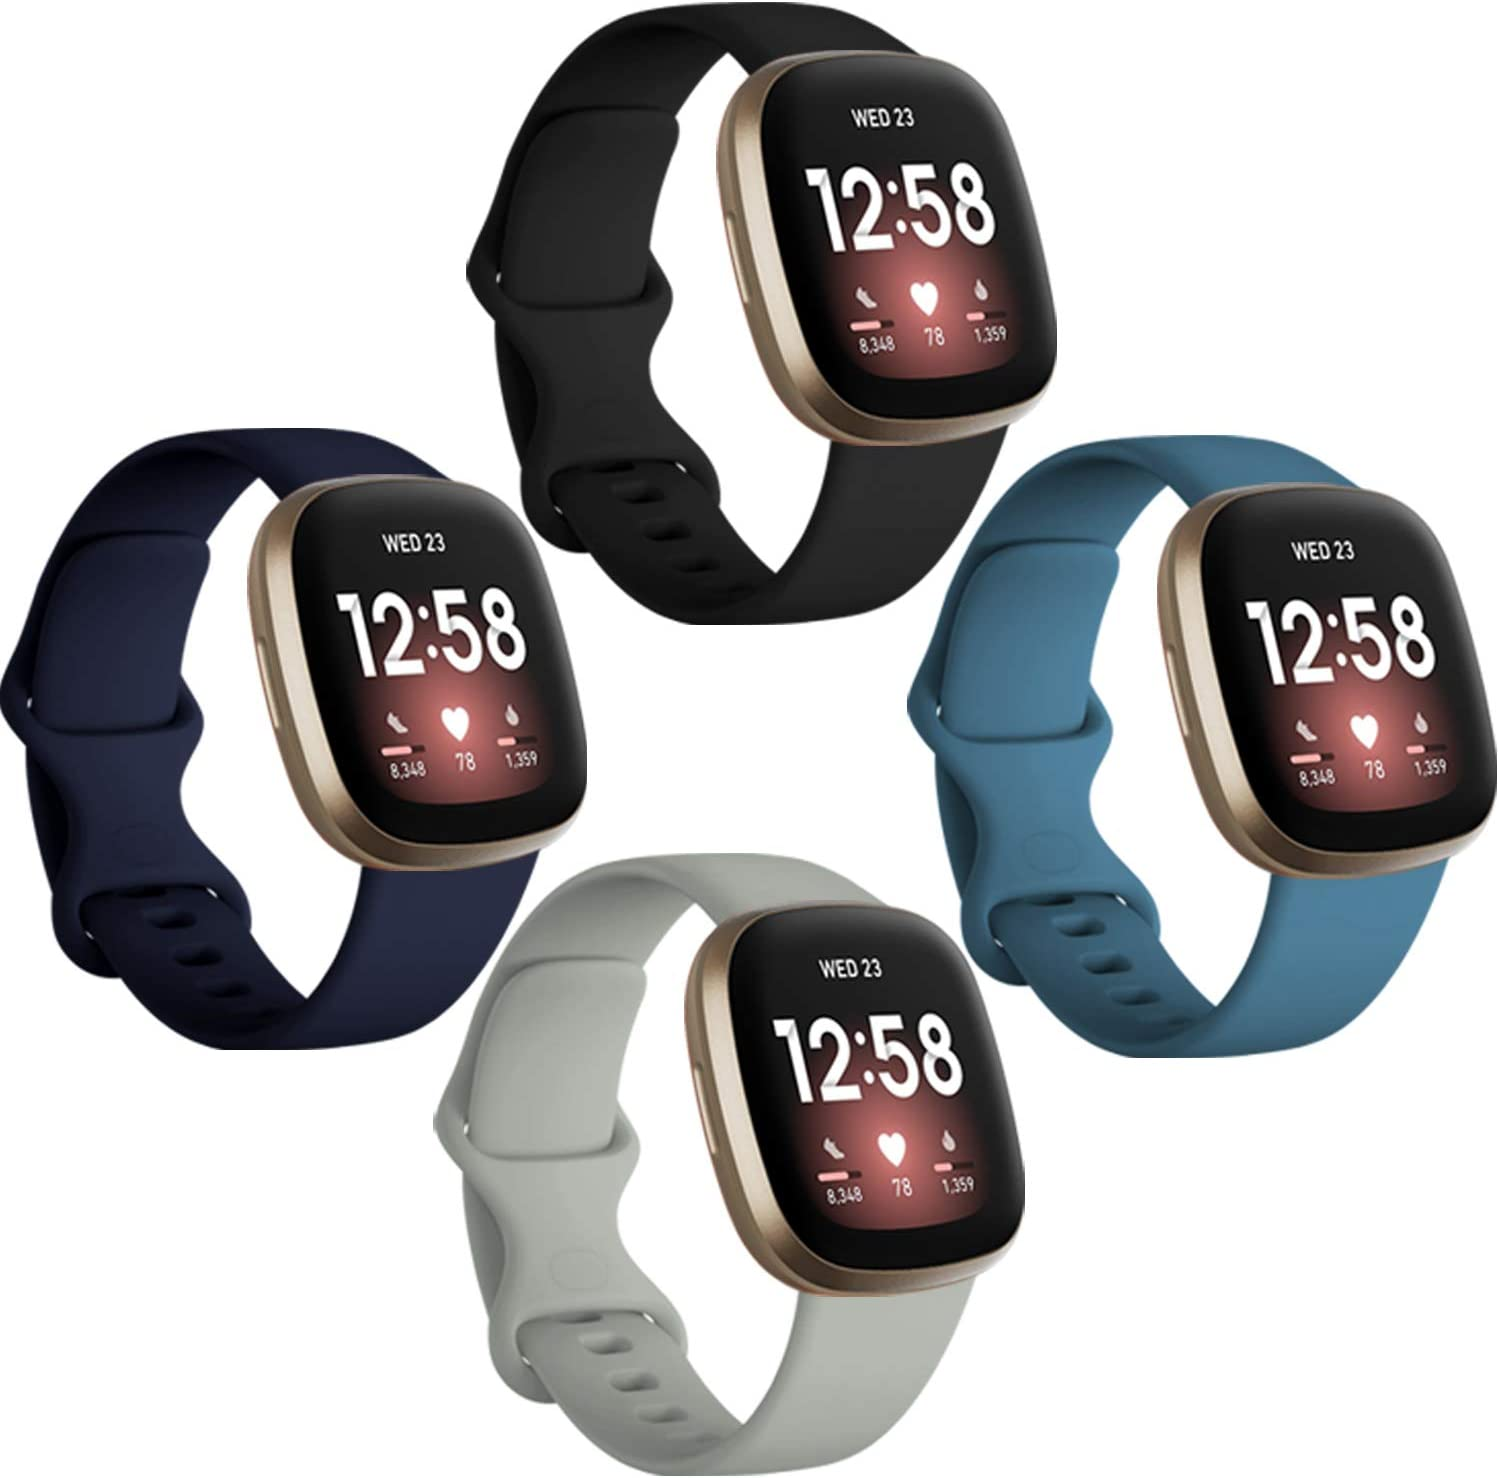 Dirrelo Bands Compatible for Fitbit Versa 3 & Sense, (4-Pack) Replacement TPU Sport Wristbands Accessories Strap for Versa 3 Sense Band Women Men, Small ( Black Dark blue Indigo Gray )